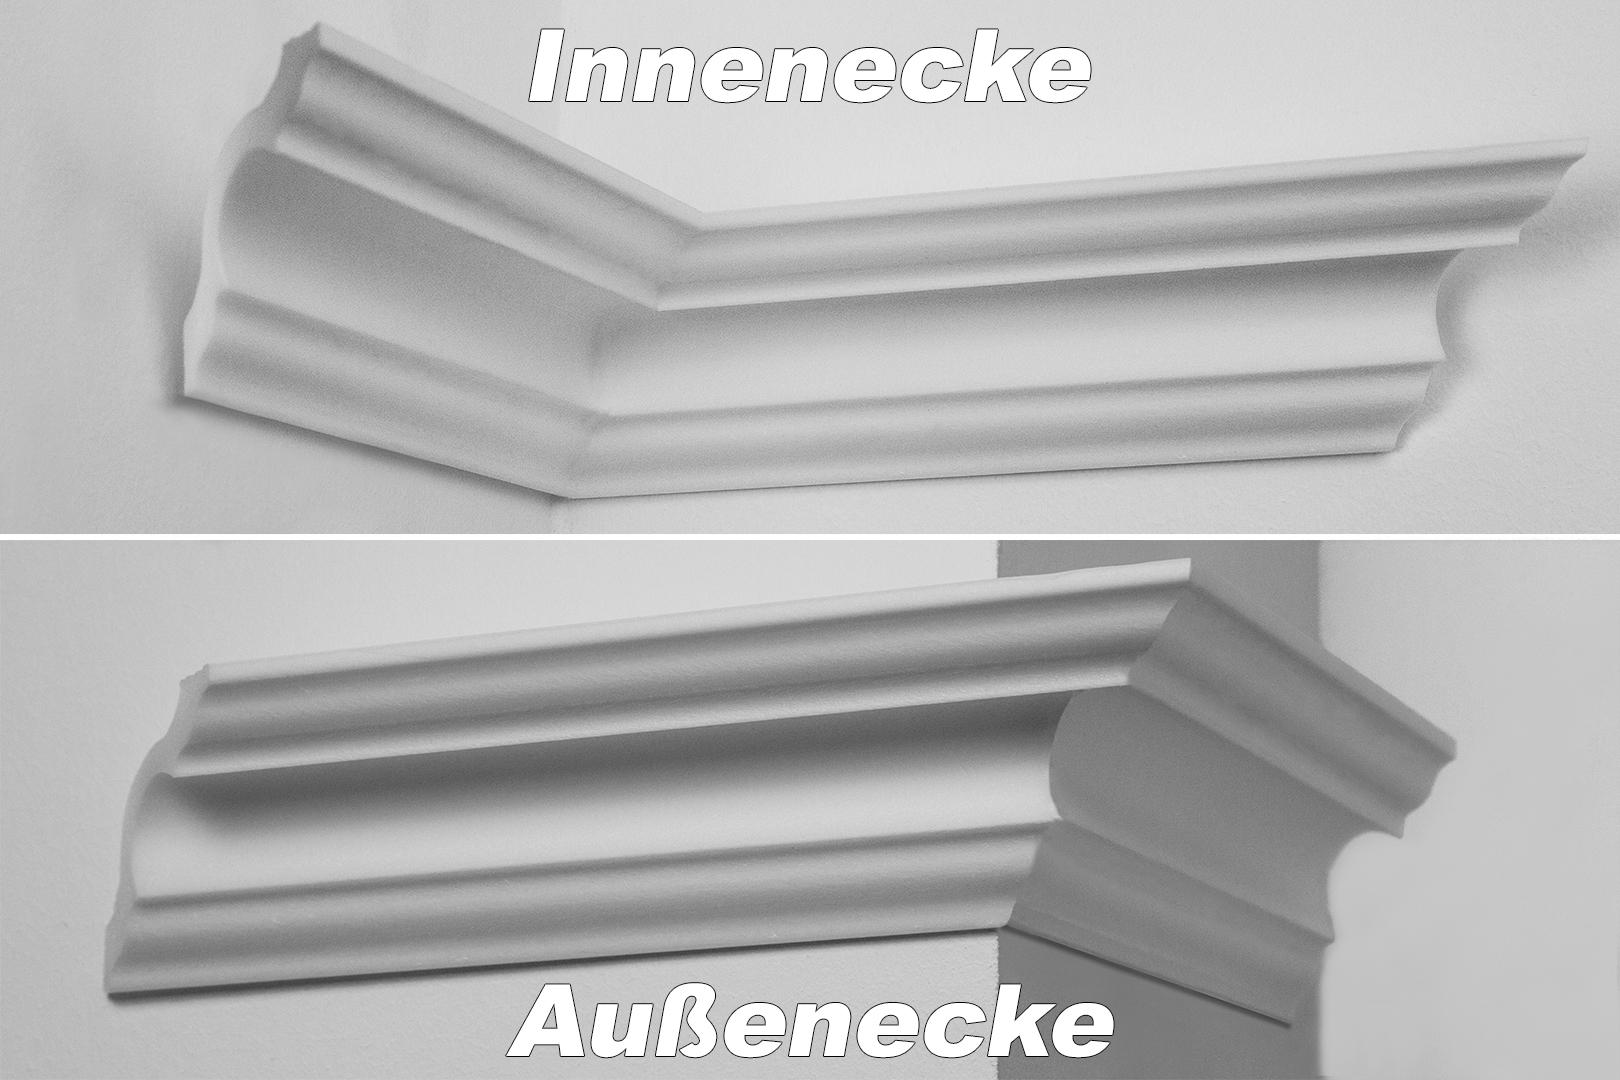 Innenecke Au/ßenecke Innendekor f/ür Stuckleiste Decora Zierleiste NK-D Modell:NK-DG50